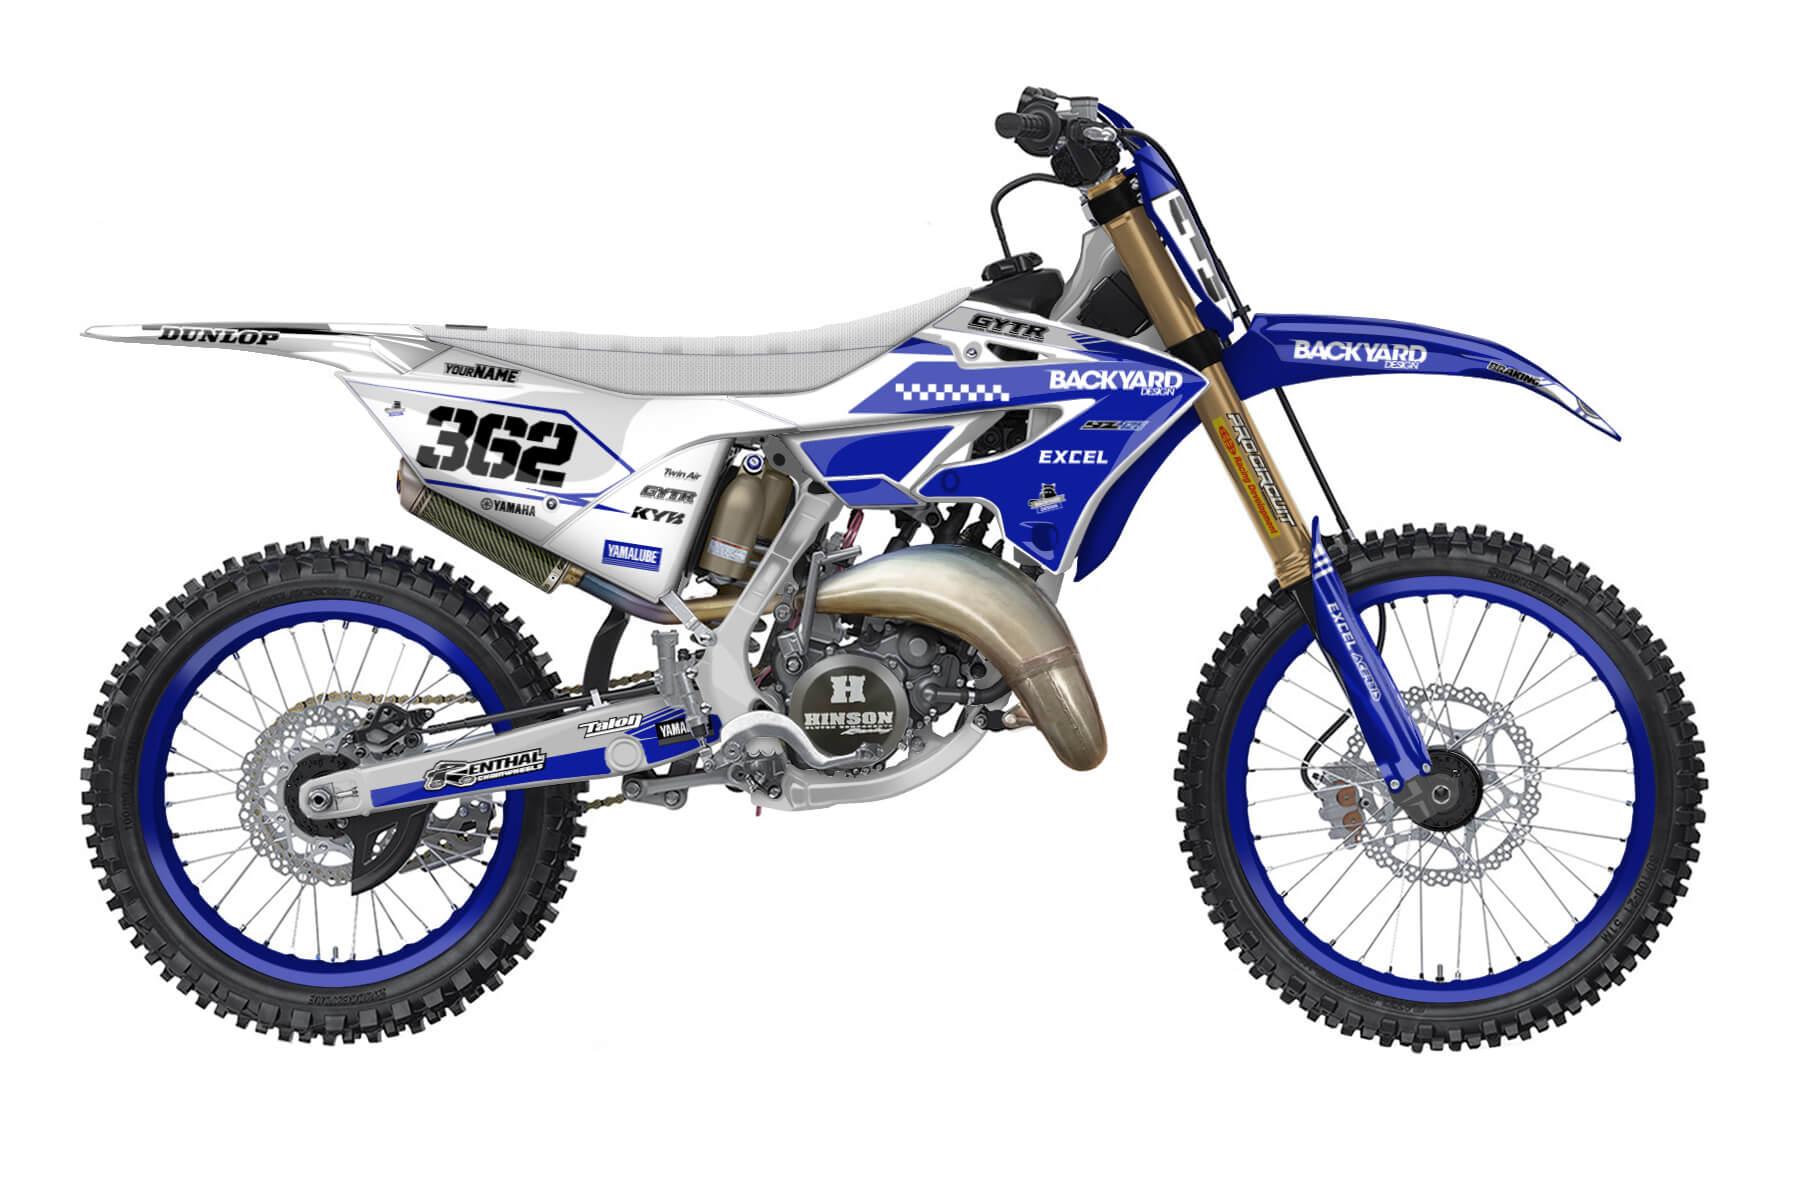 Yamaha YZ 250 - 2022 - Backyard Design - Mx Dekor - Feature Limited Pro